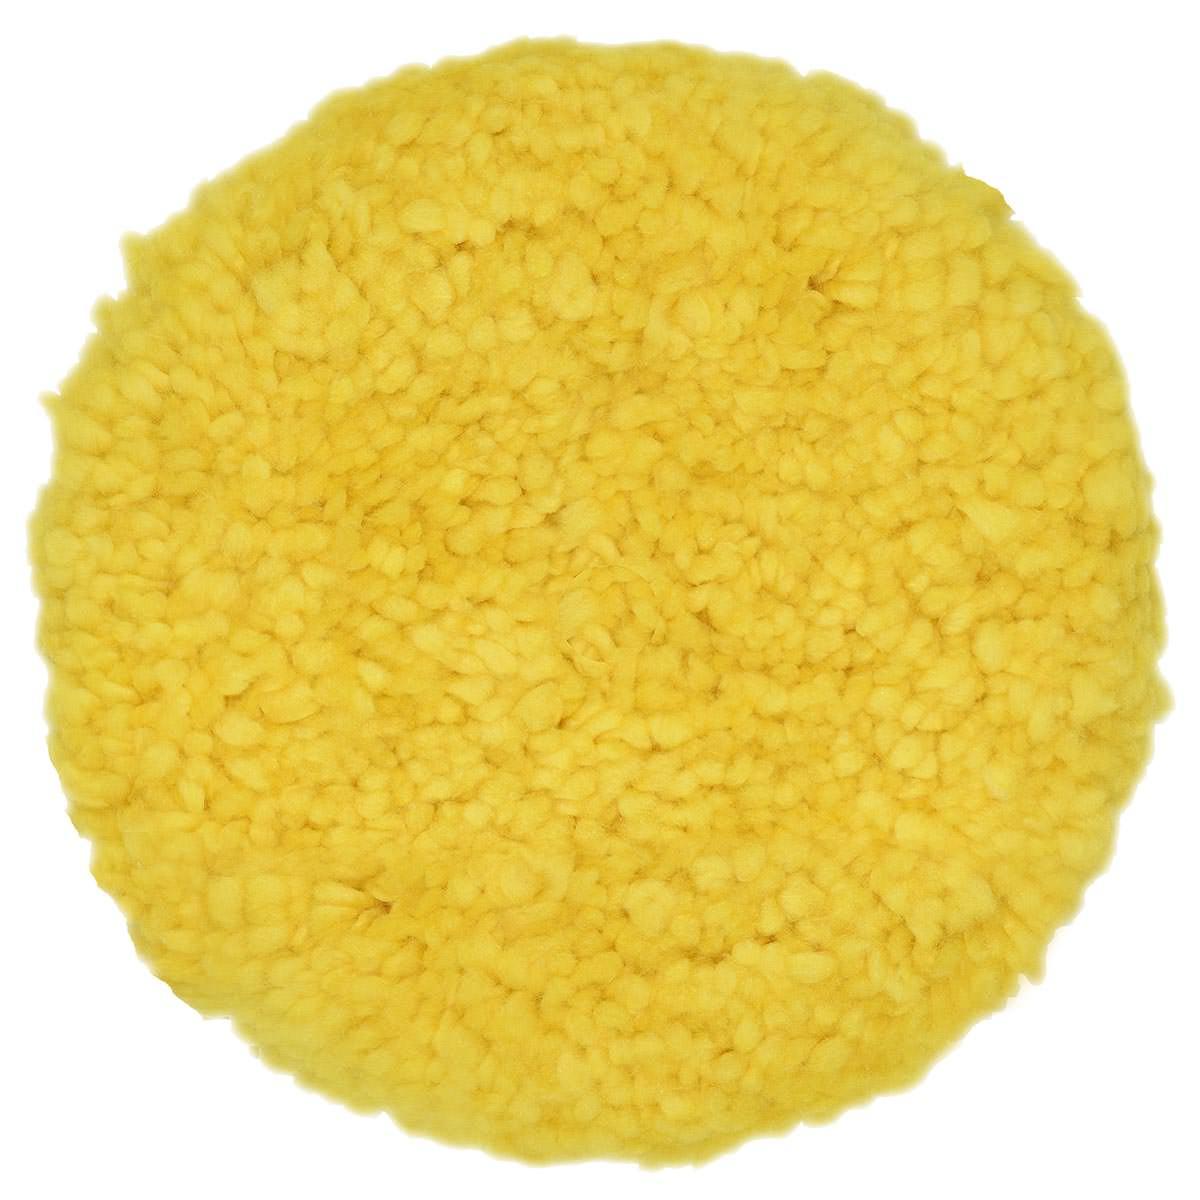 Lincoln Boina Dupla Face Fio Macia Amarela 8